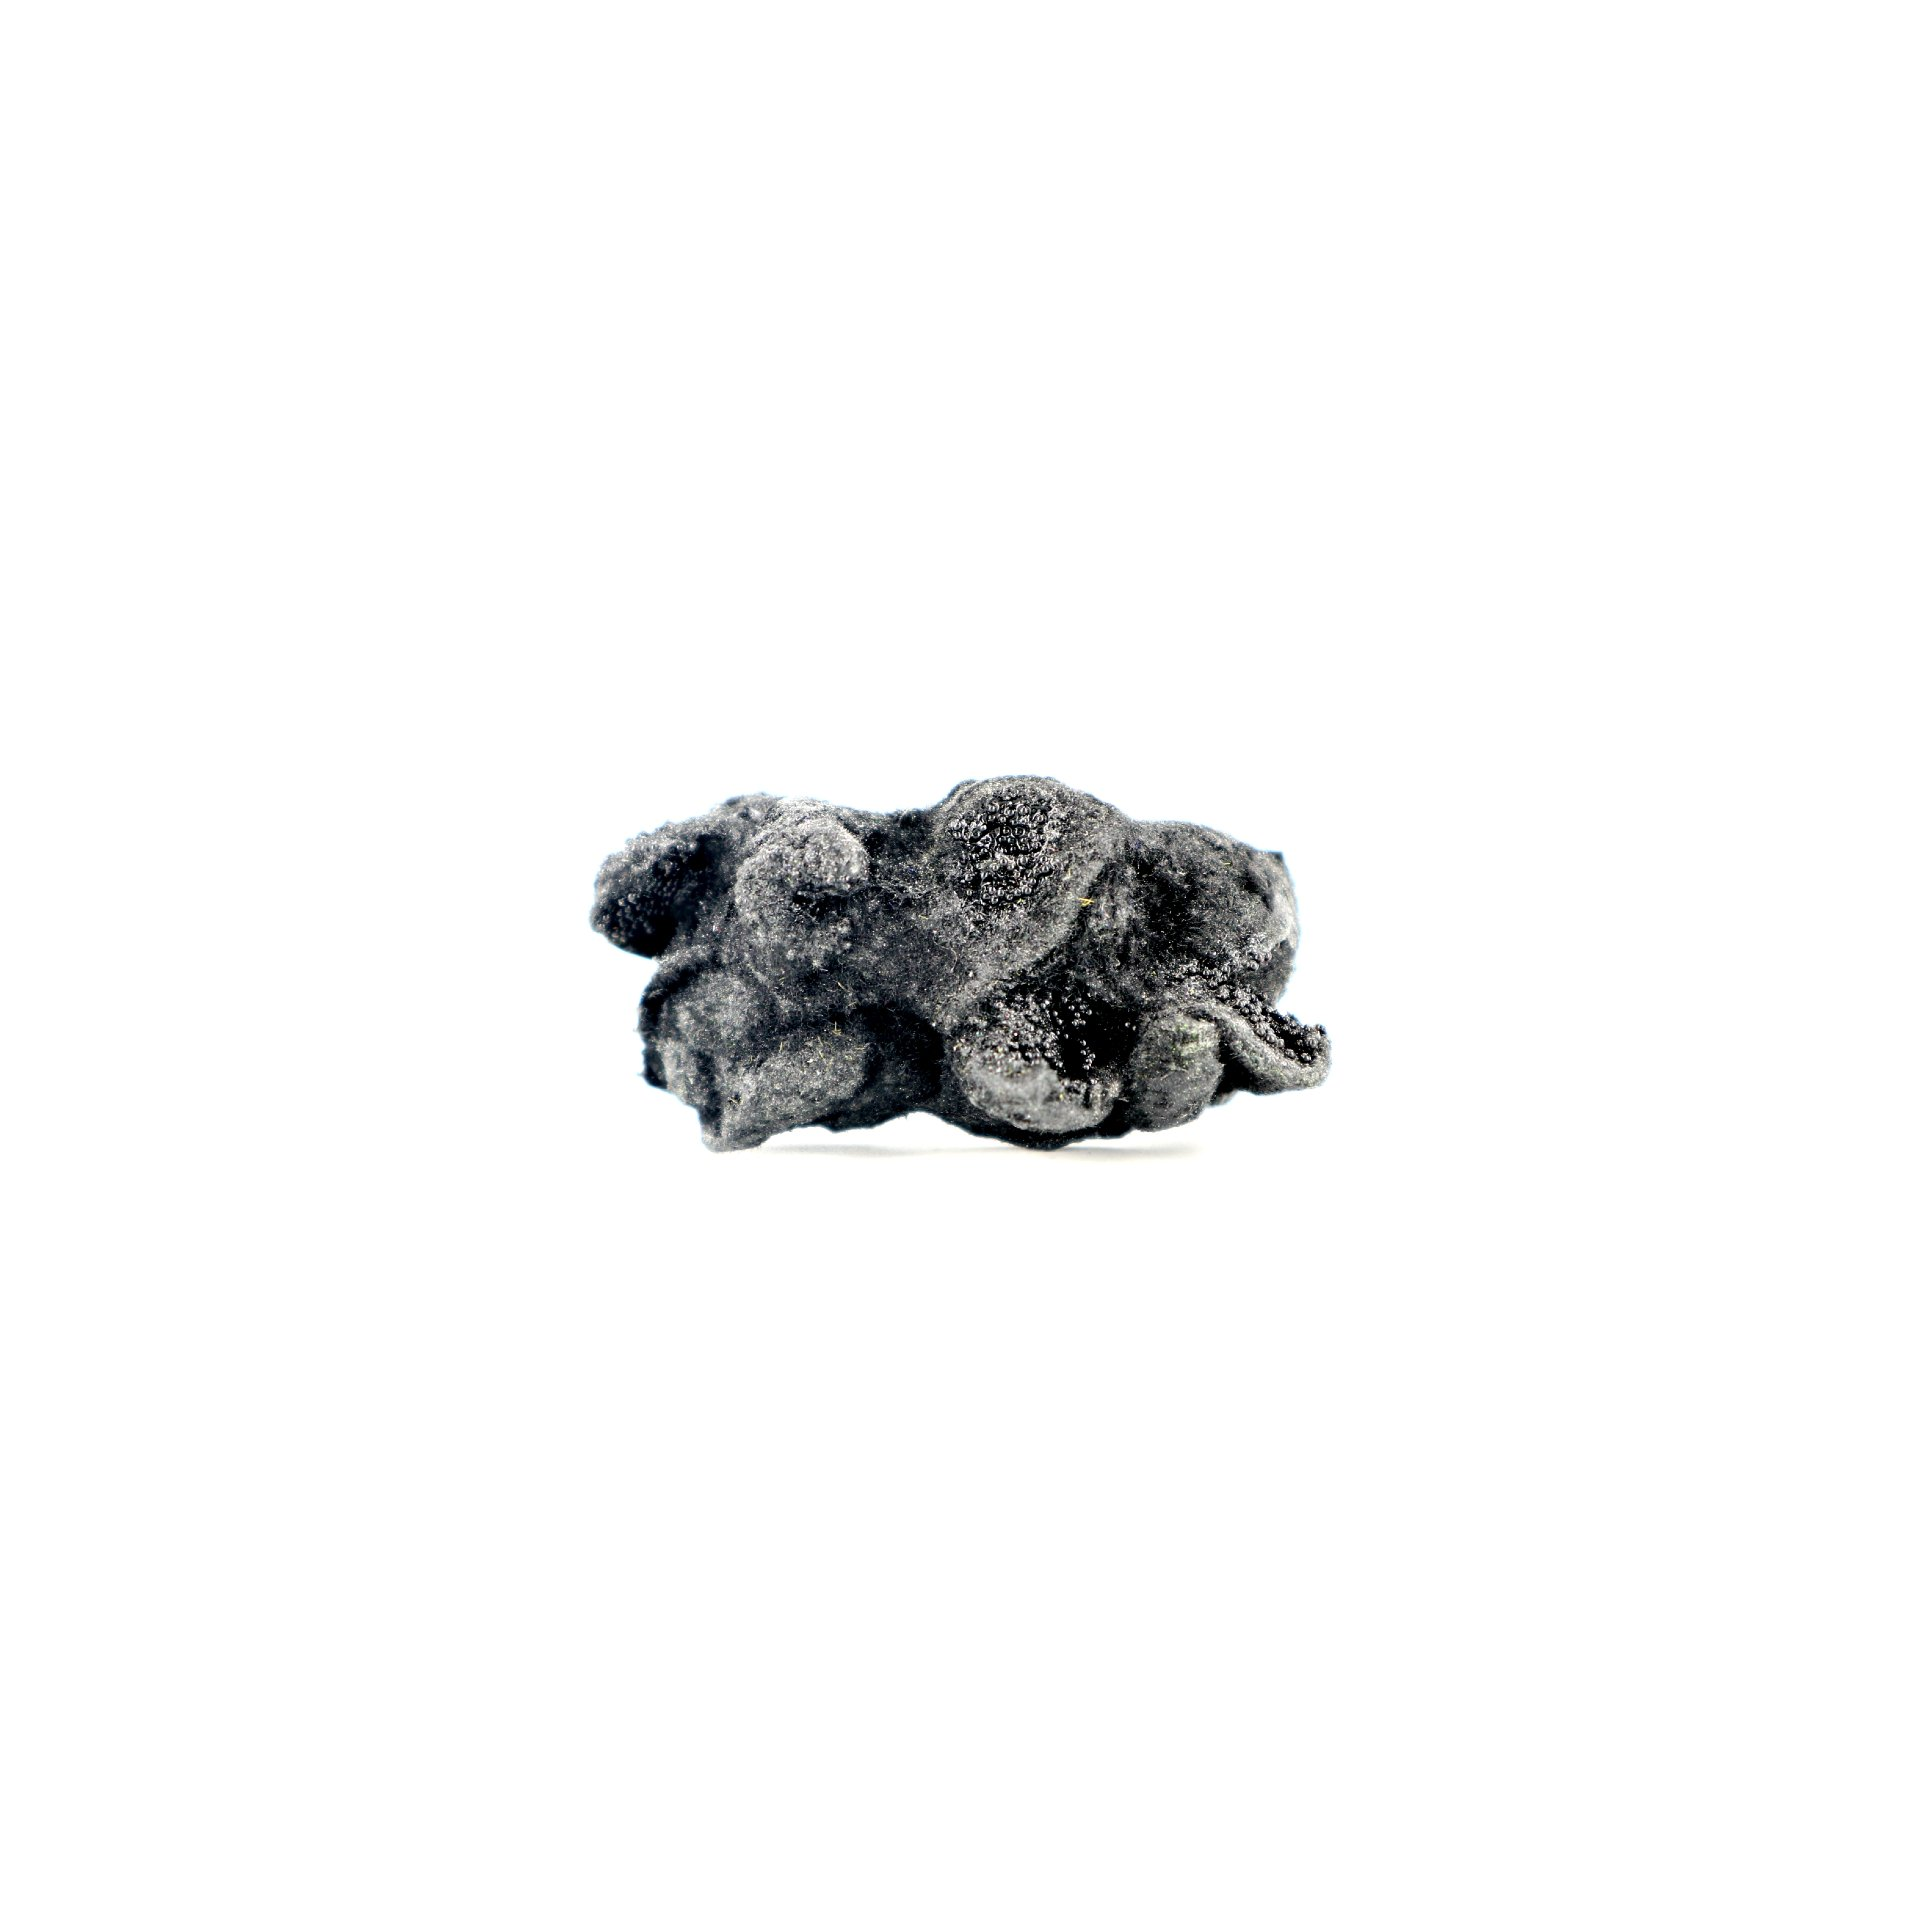 RESIN NTERMEZZO - BLACK RING NO.1